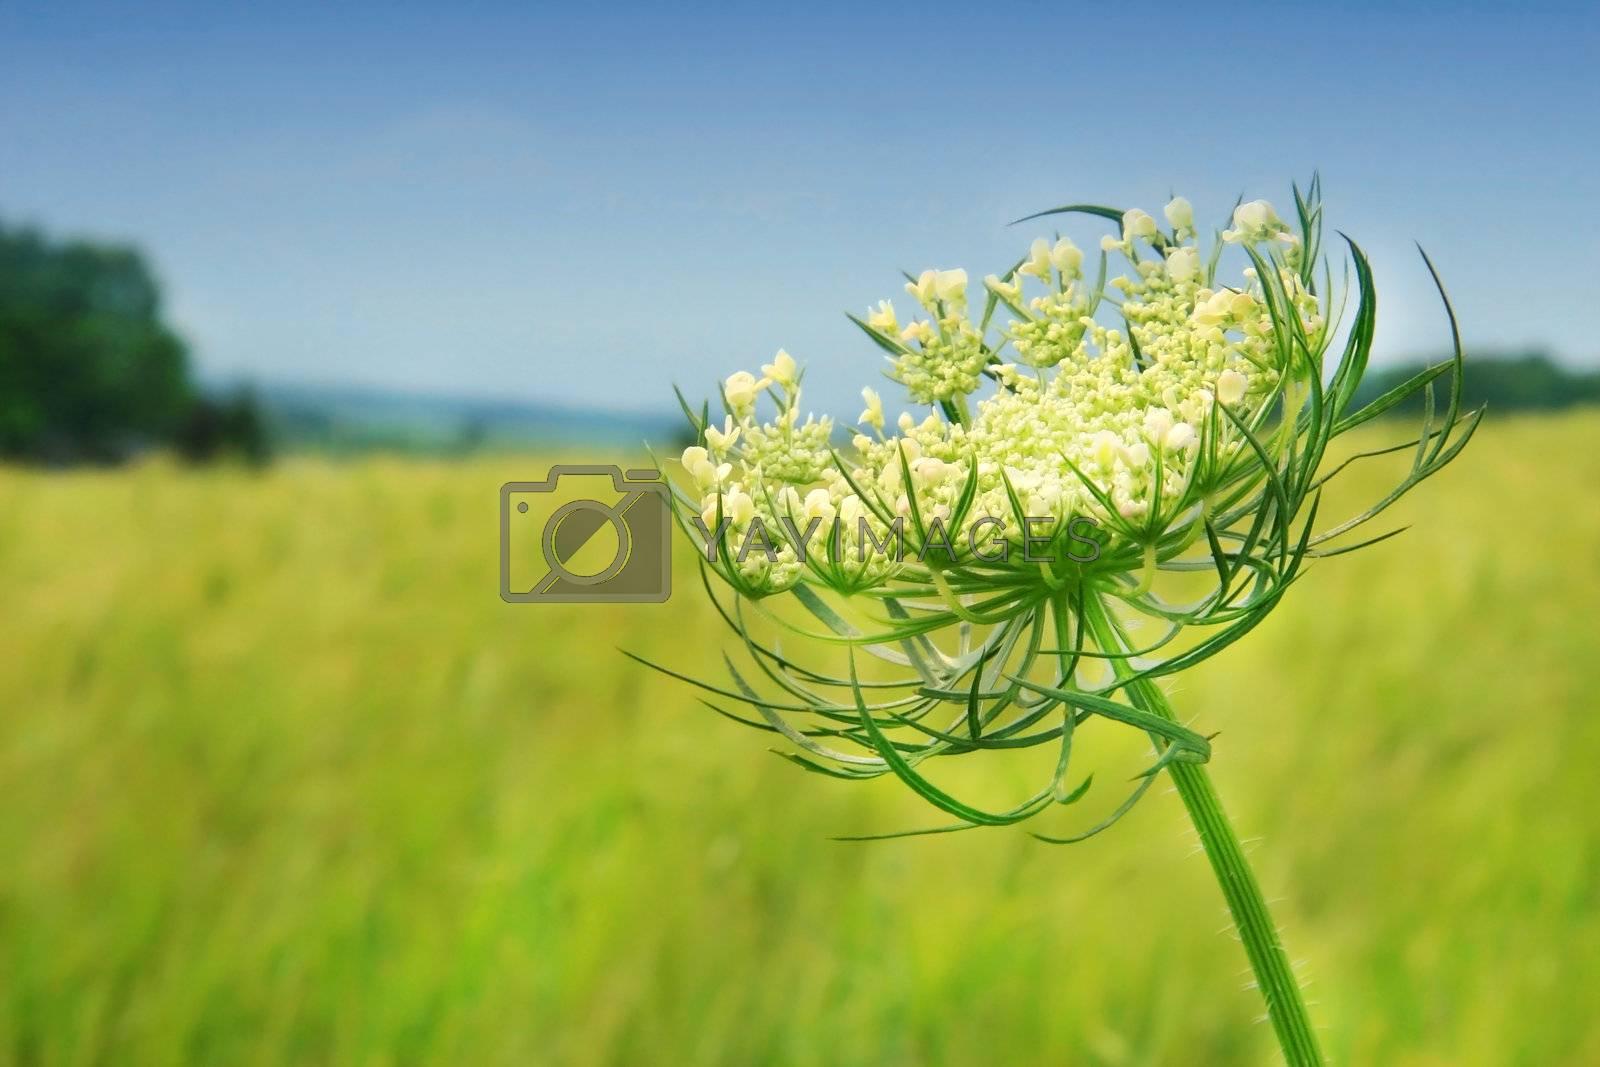 Wild flower against the blue sky